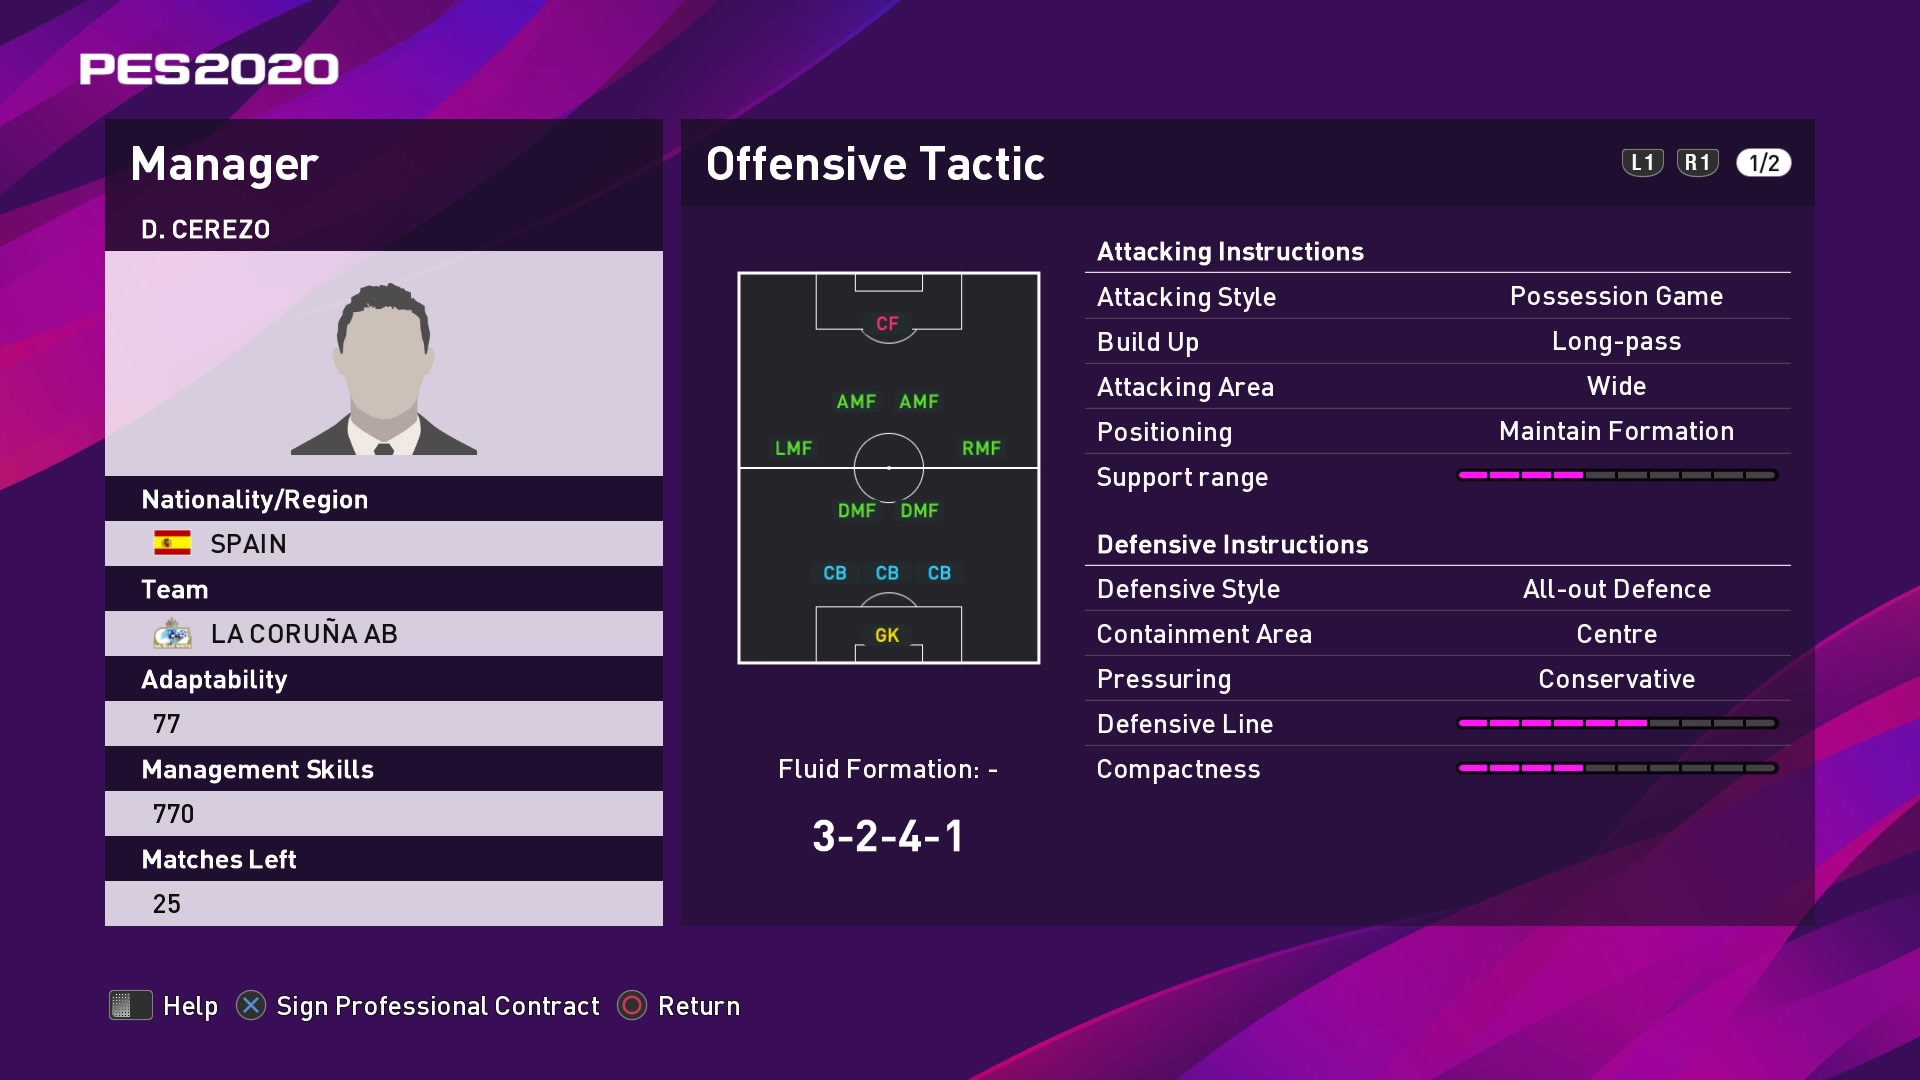 D. Cerezo (Fernando Vázquez) Offensive Tactic in PES 2020 myClub